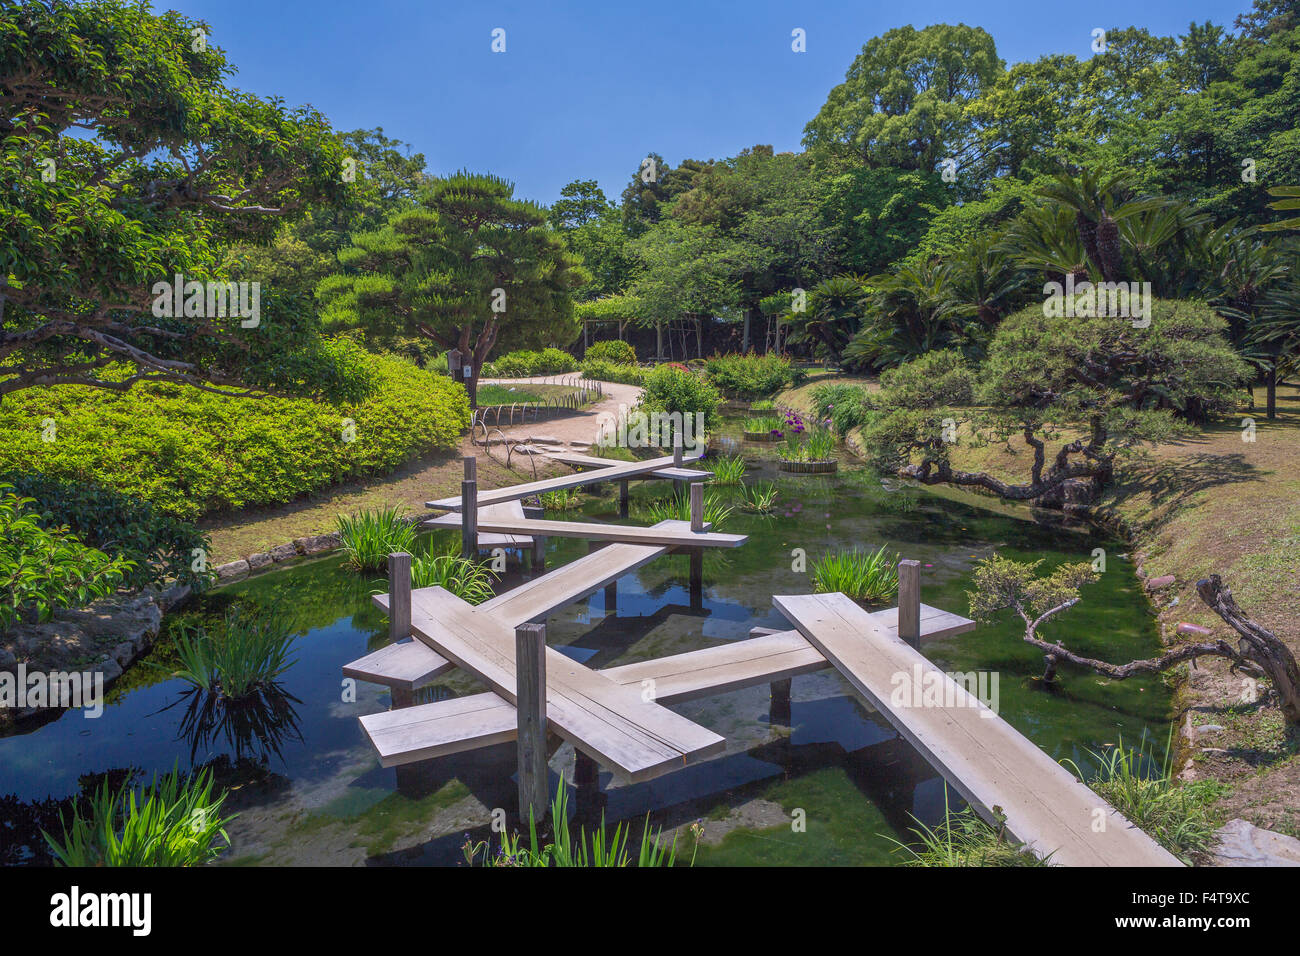 Giappone, Okayama, il Giardino Korakuen bridge Immagini Stock